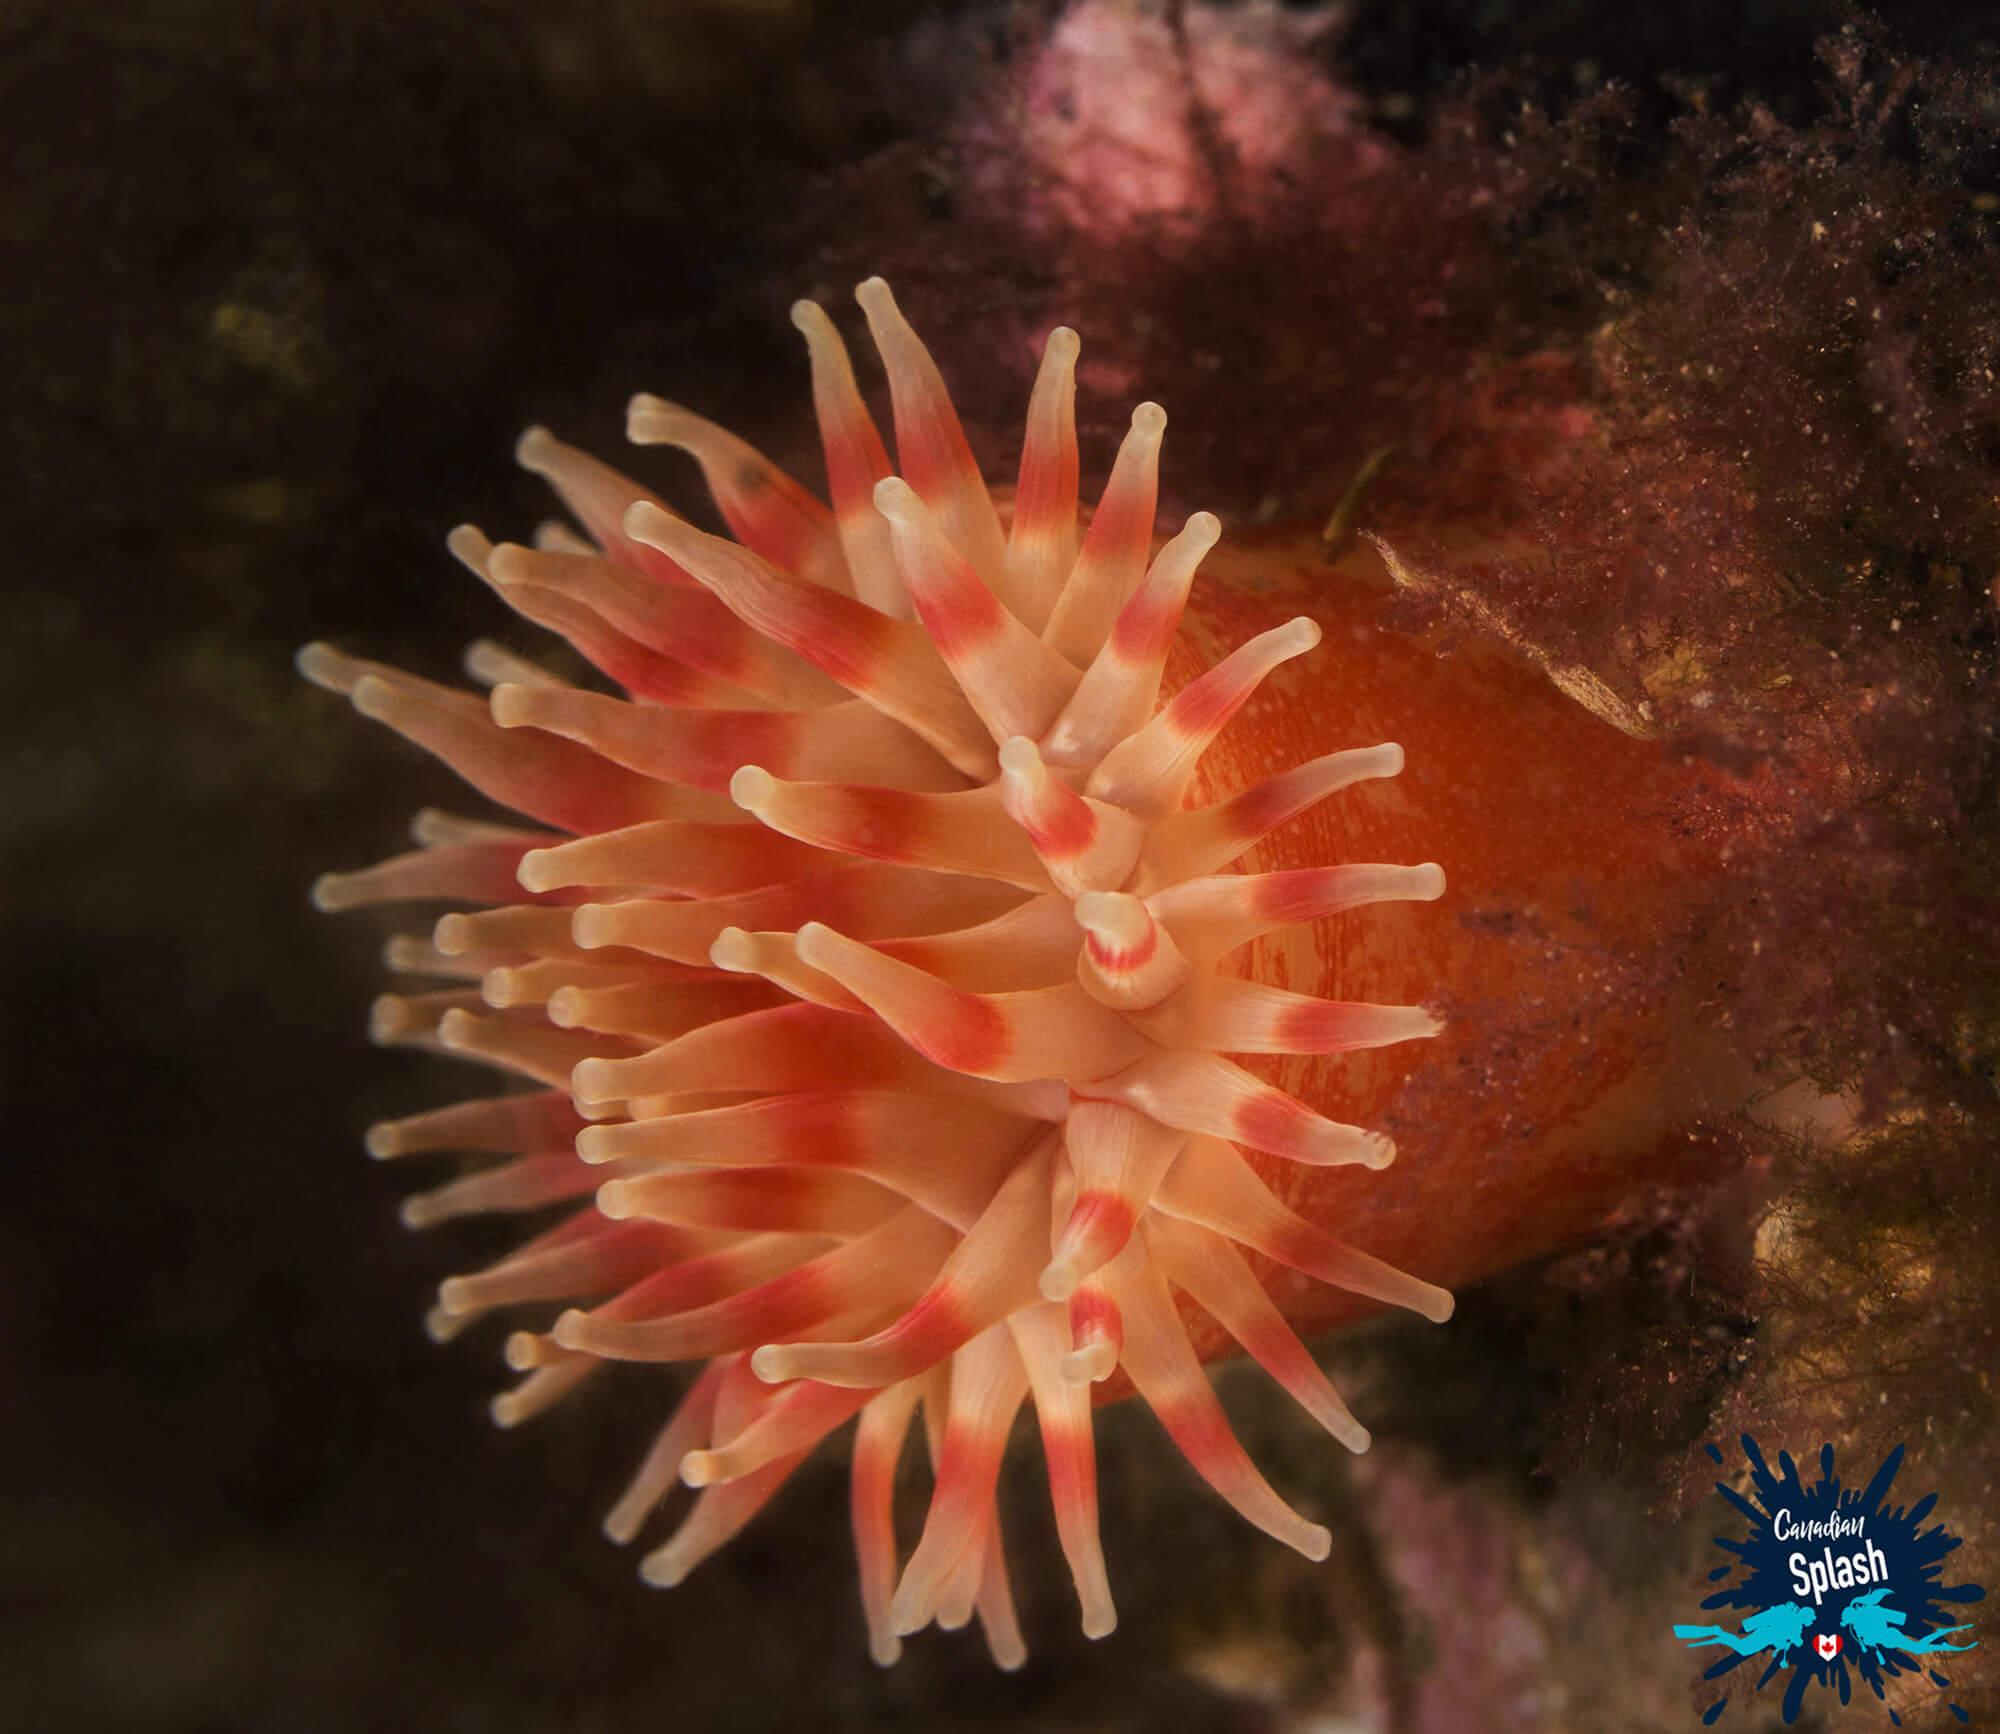 Northern Red Sea Anemone Among the Rocks Scuba Diving Terrence Bay, Halifax, Nova Scotia, Canadian Splash